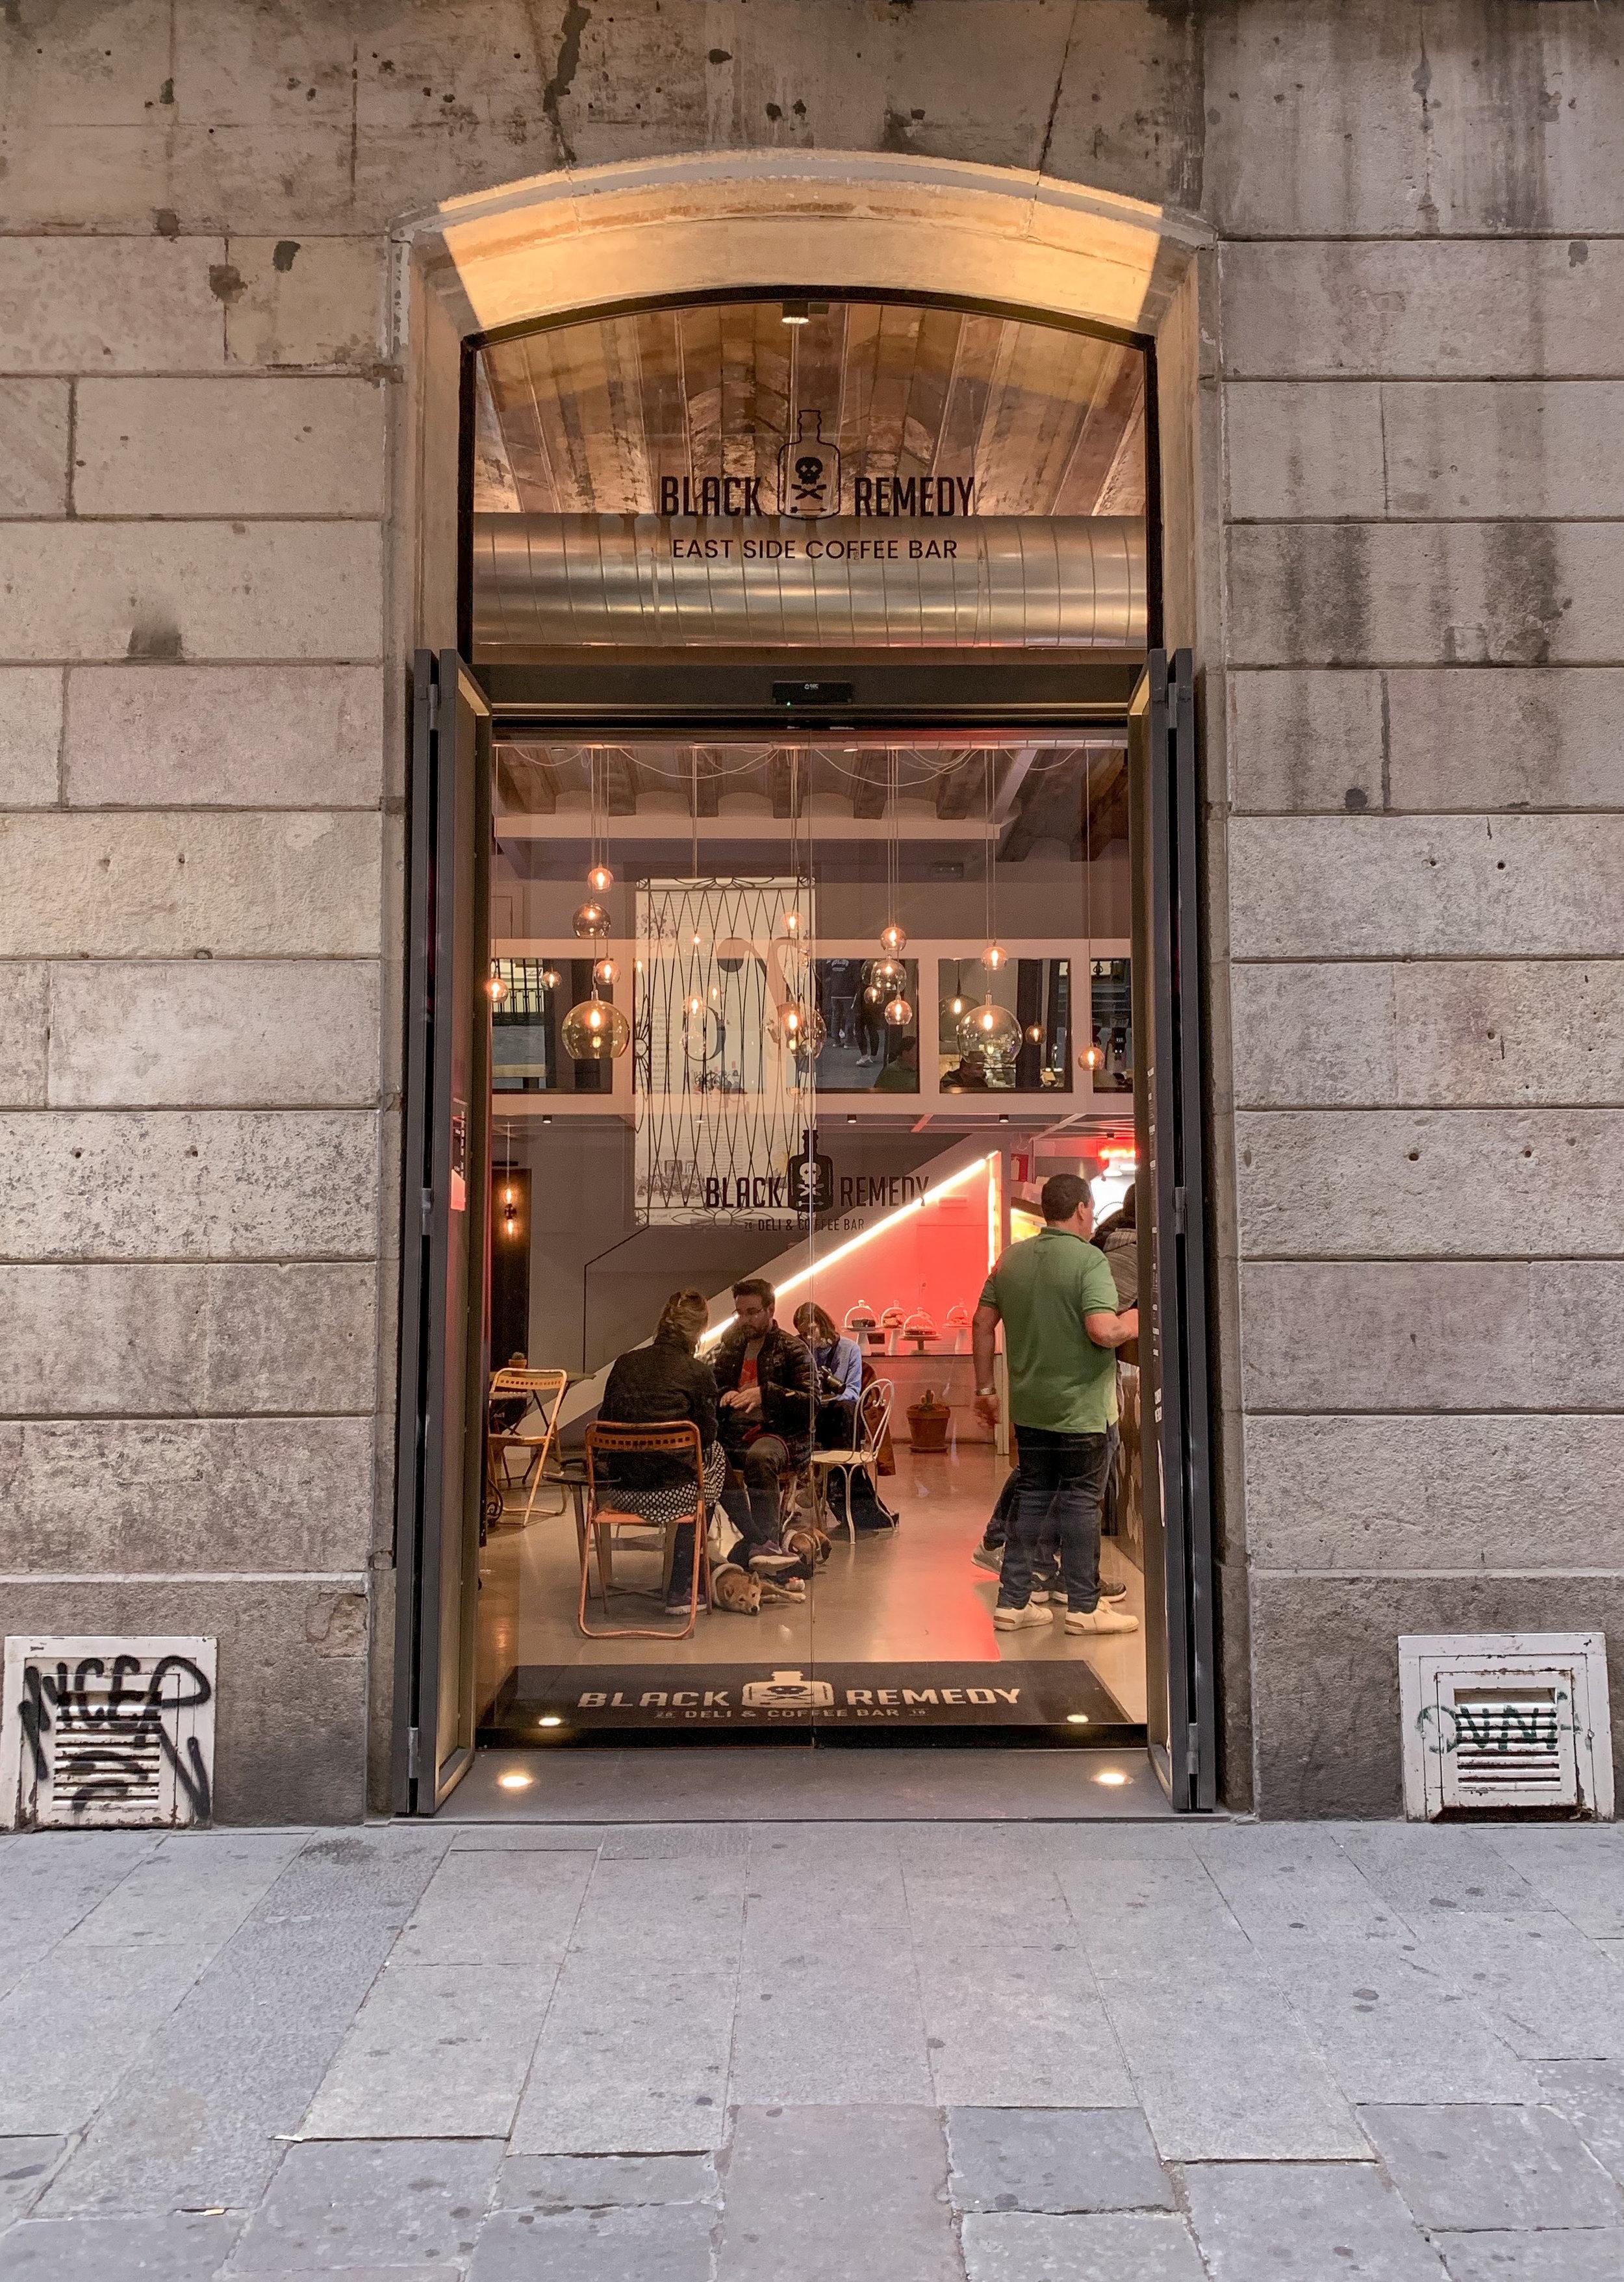 caffeine fix in Barcelona